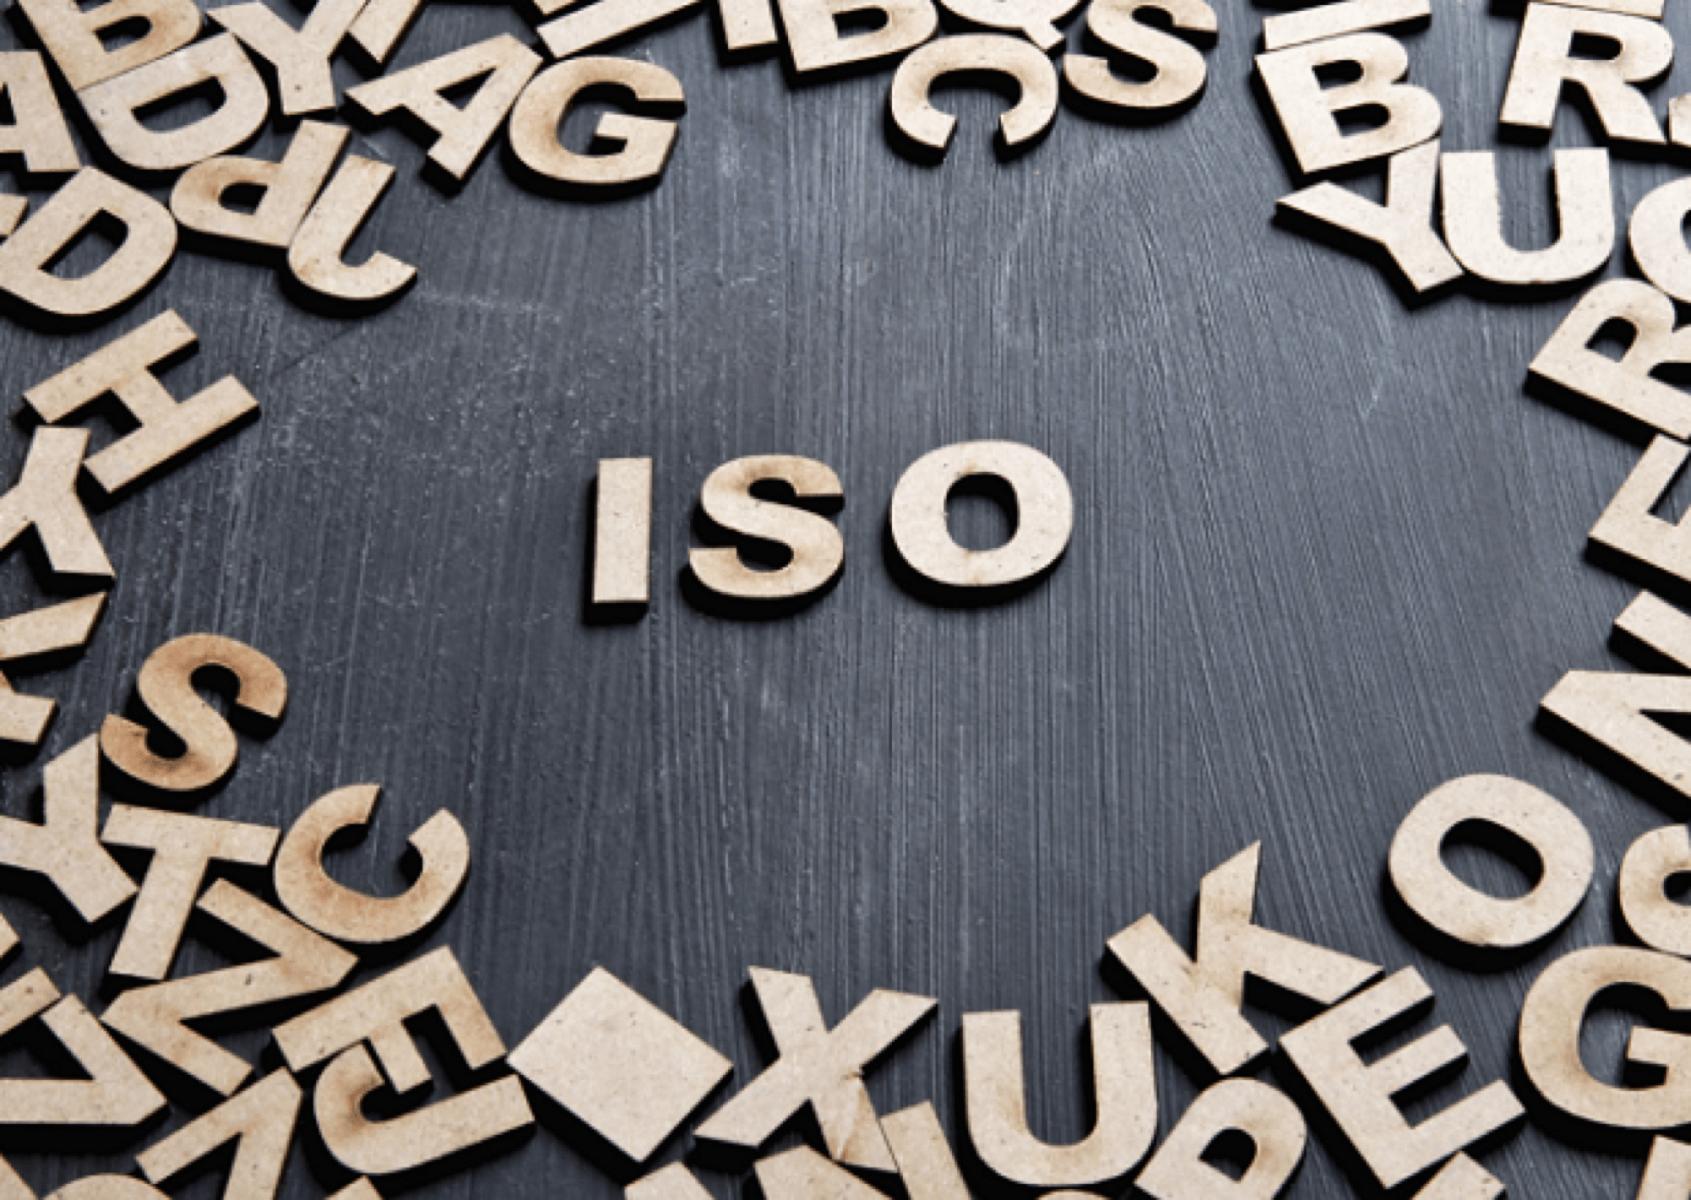 iso 9001 accredited companies list uk